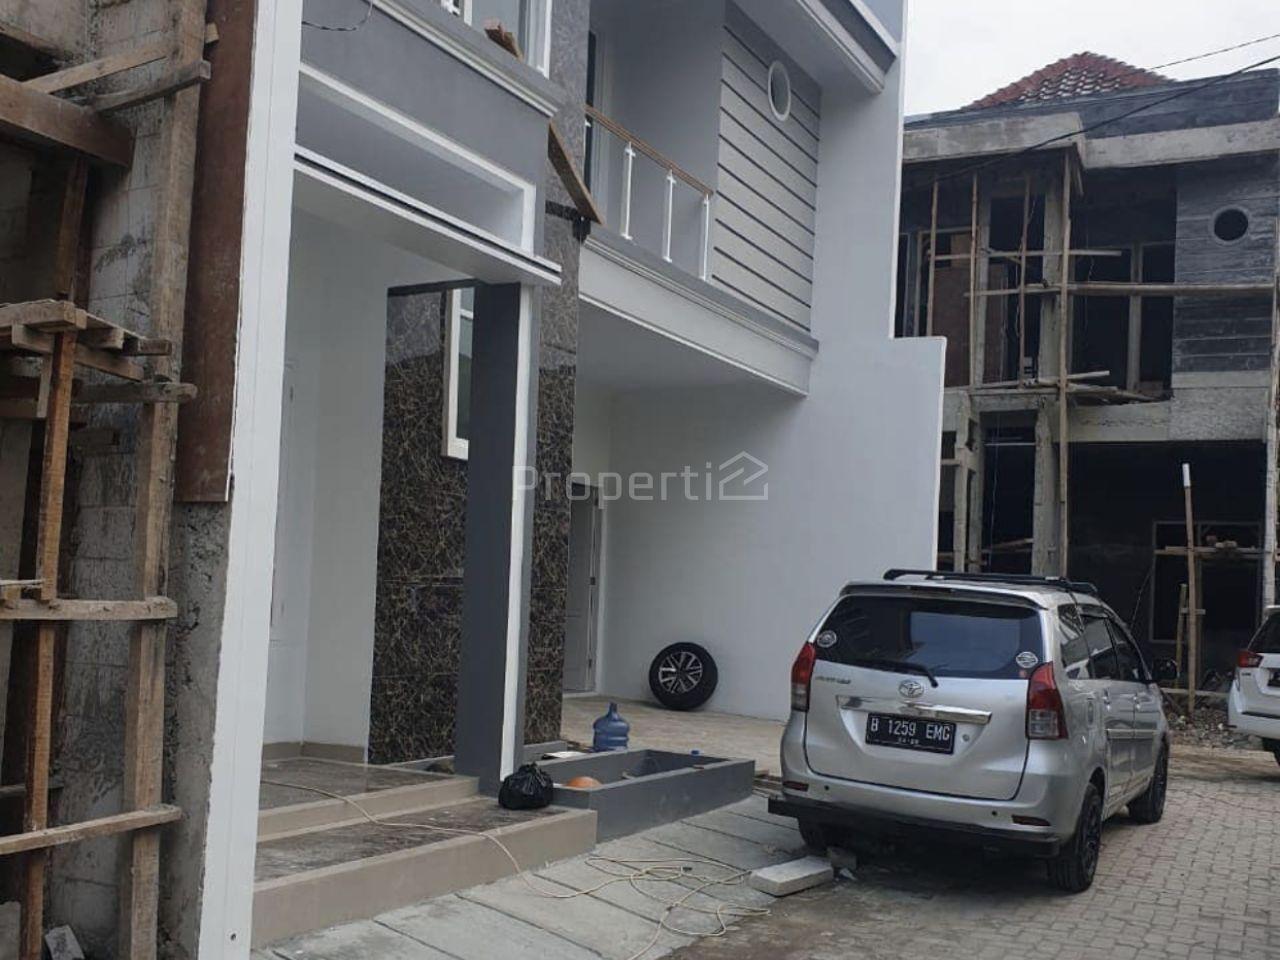 Rumah Baru di Jagakarsa, Jakarta Selatan, DKI Jakarta